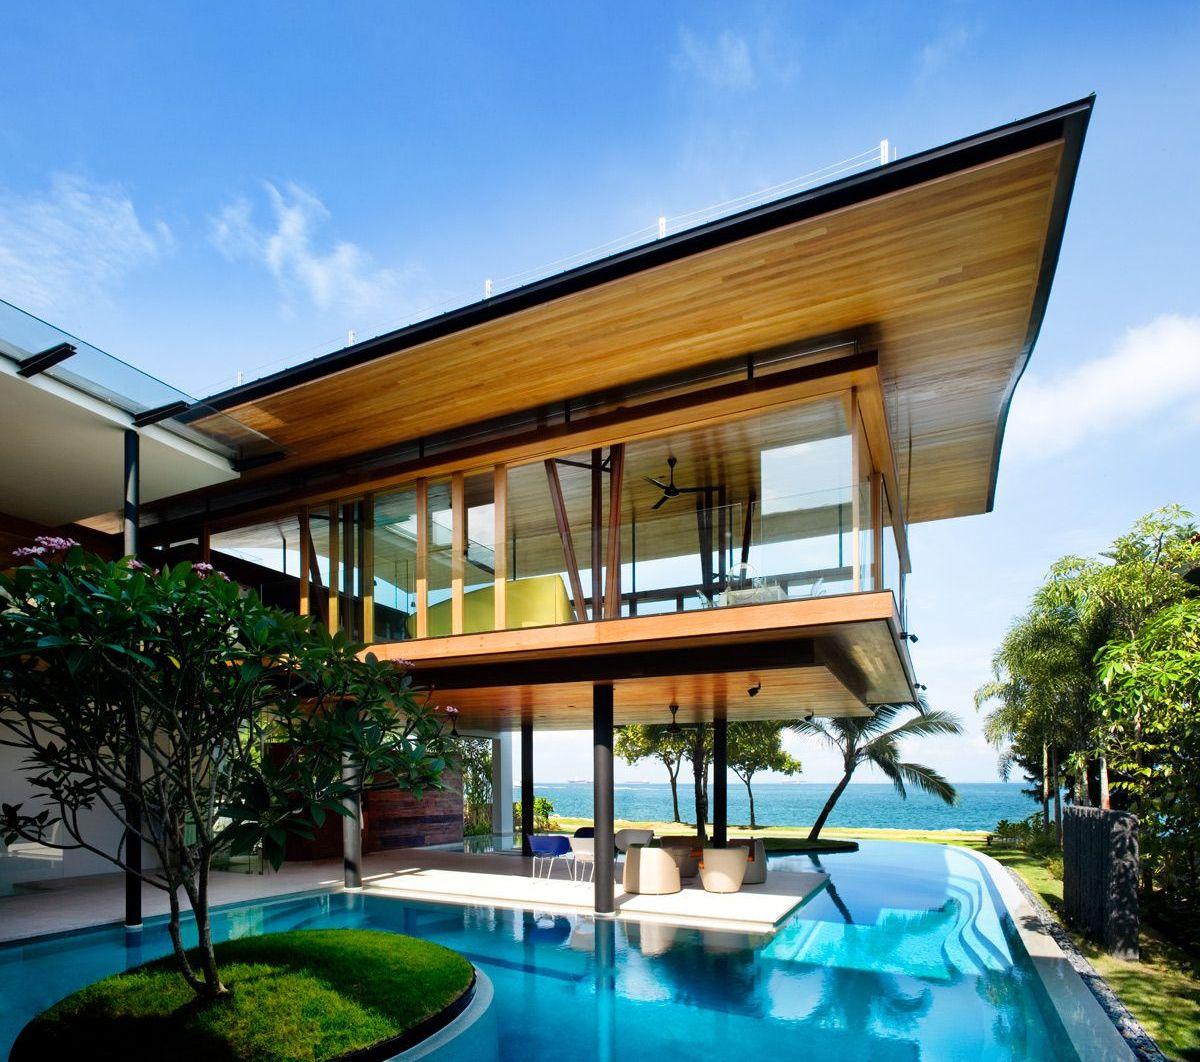 Luxury Fish House by Guz Architects  Architecture  Design